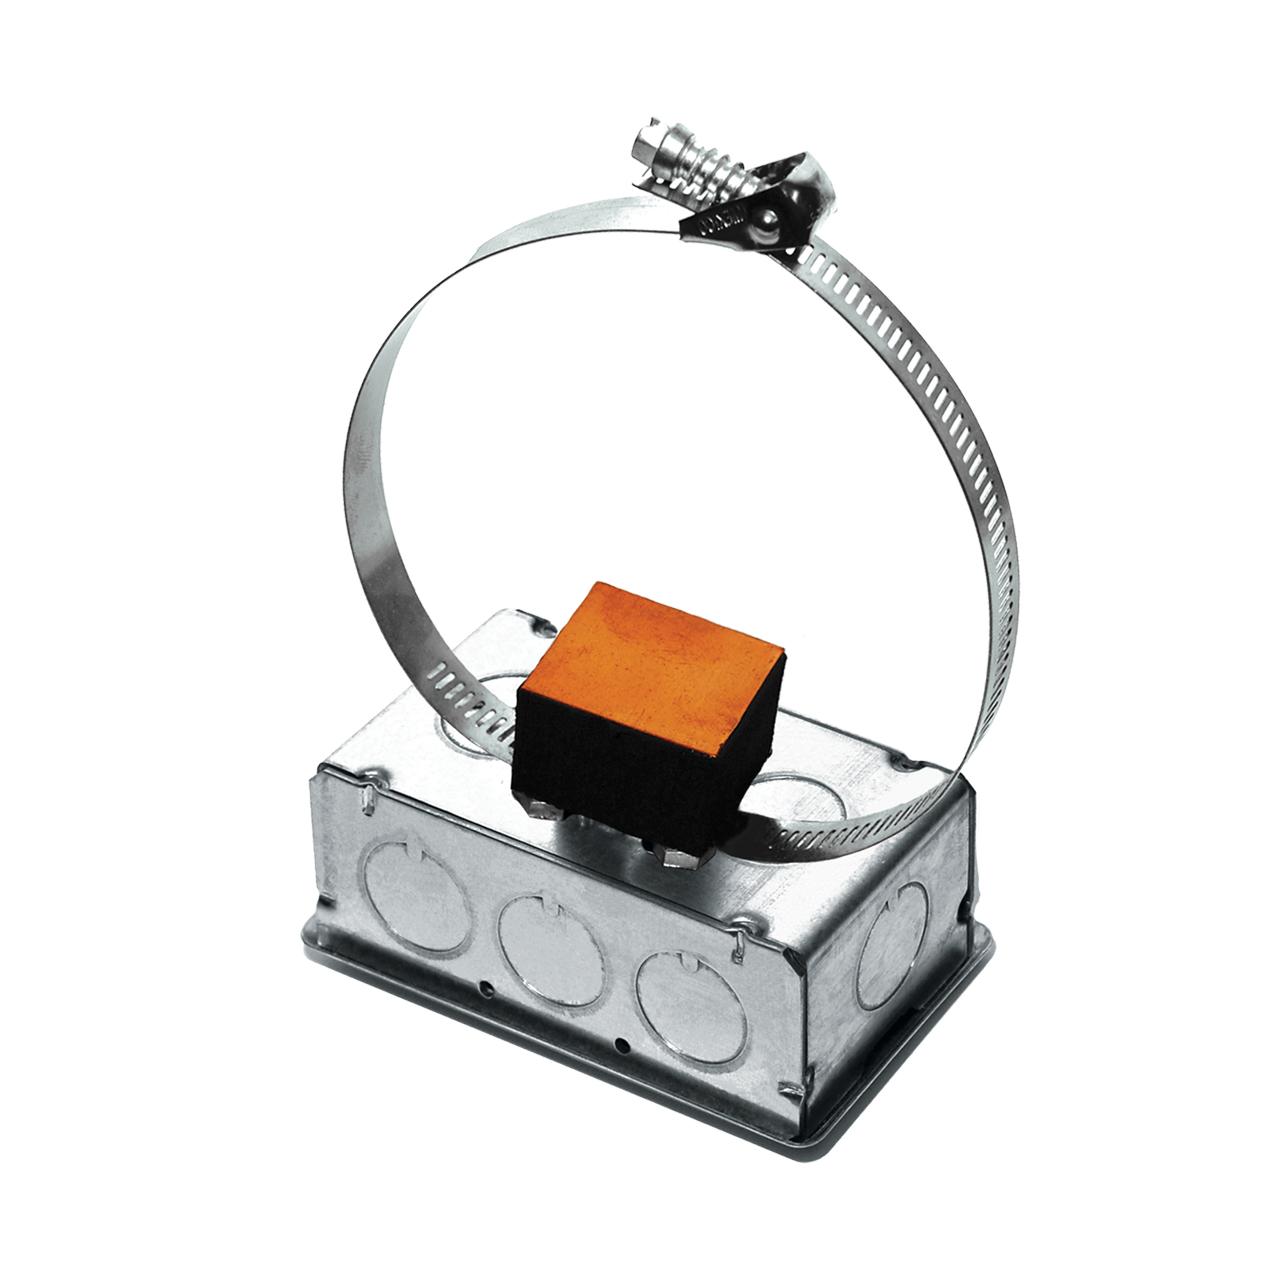 carrier-NSA-PIPE-pipe-mount-temp-sensor-b